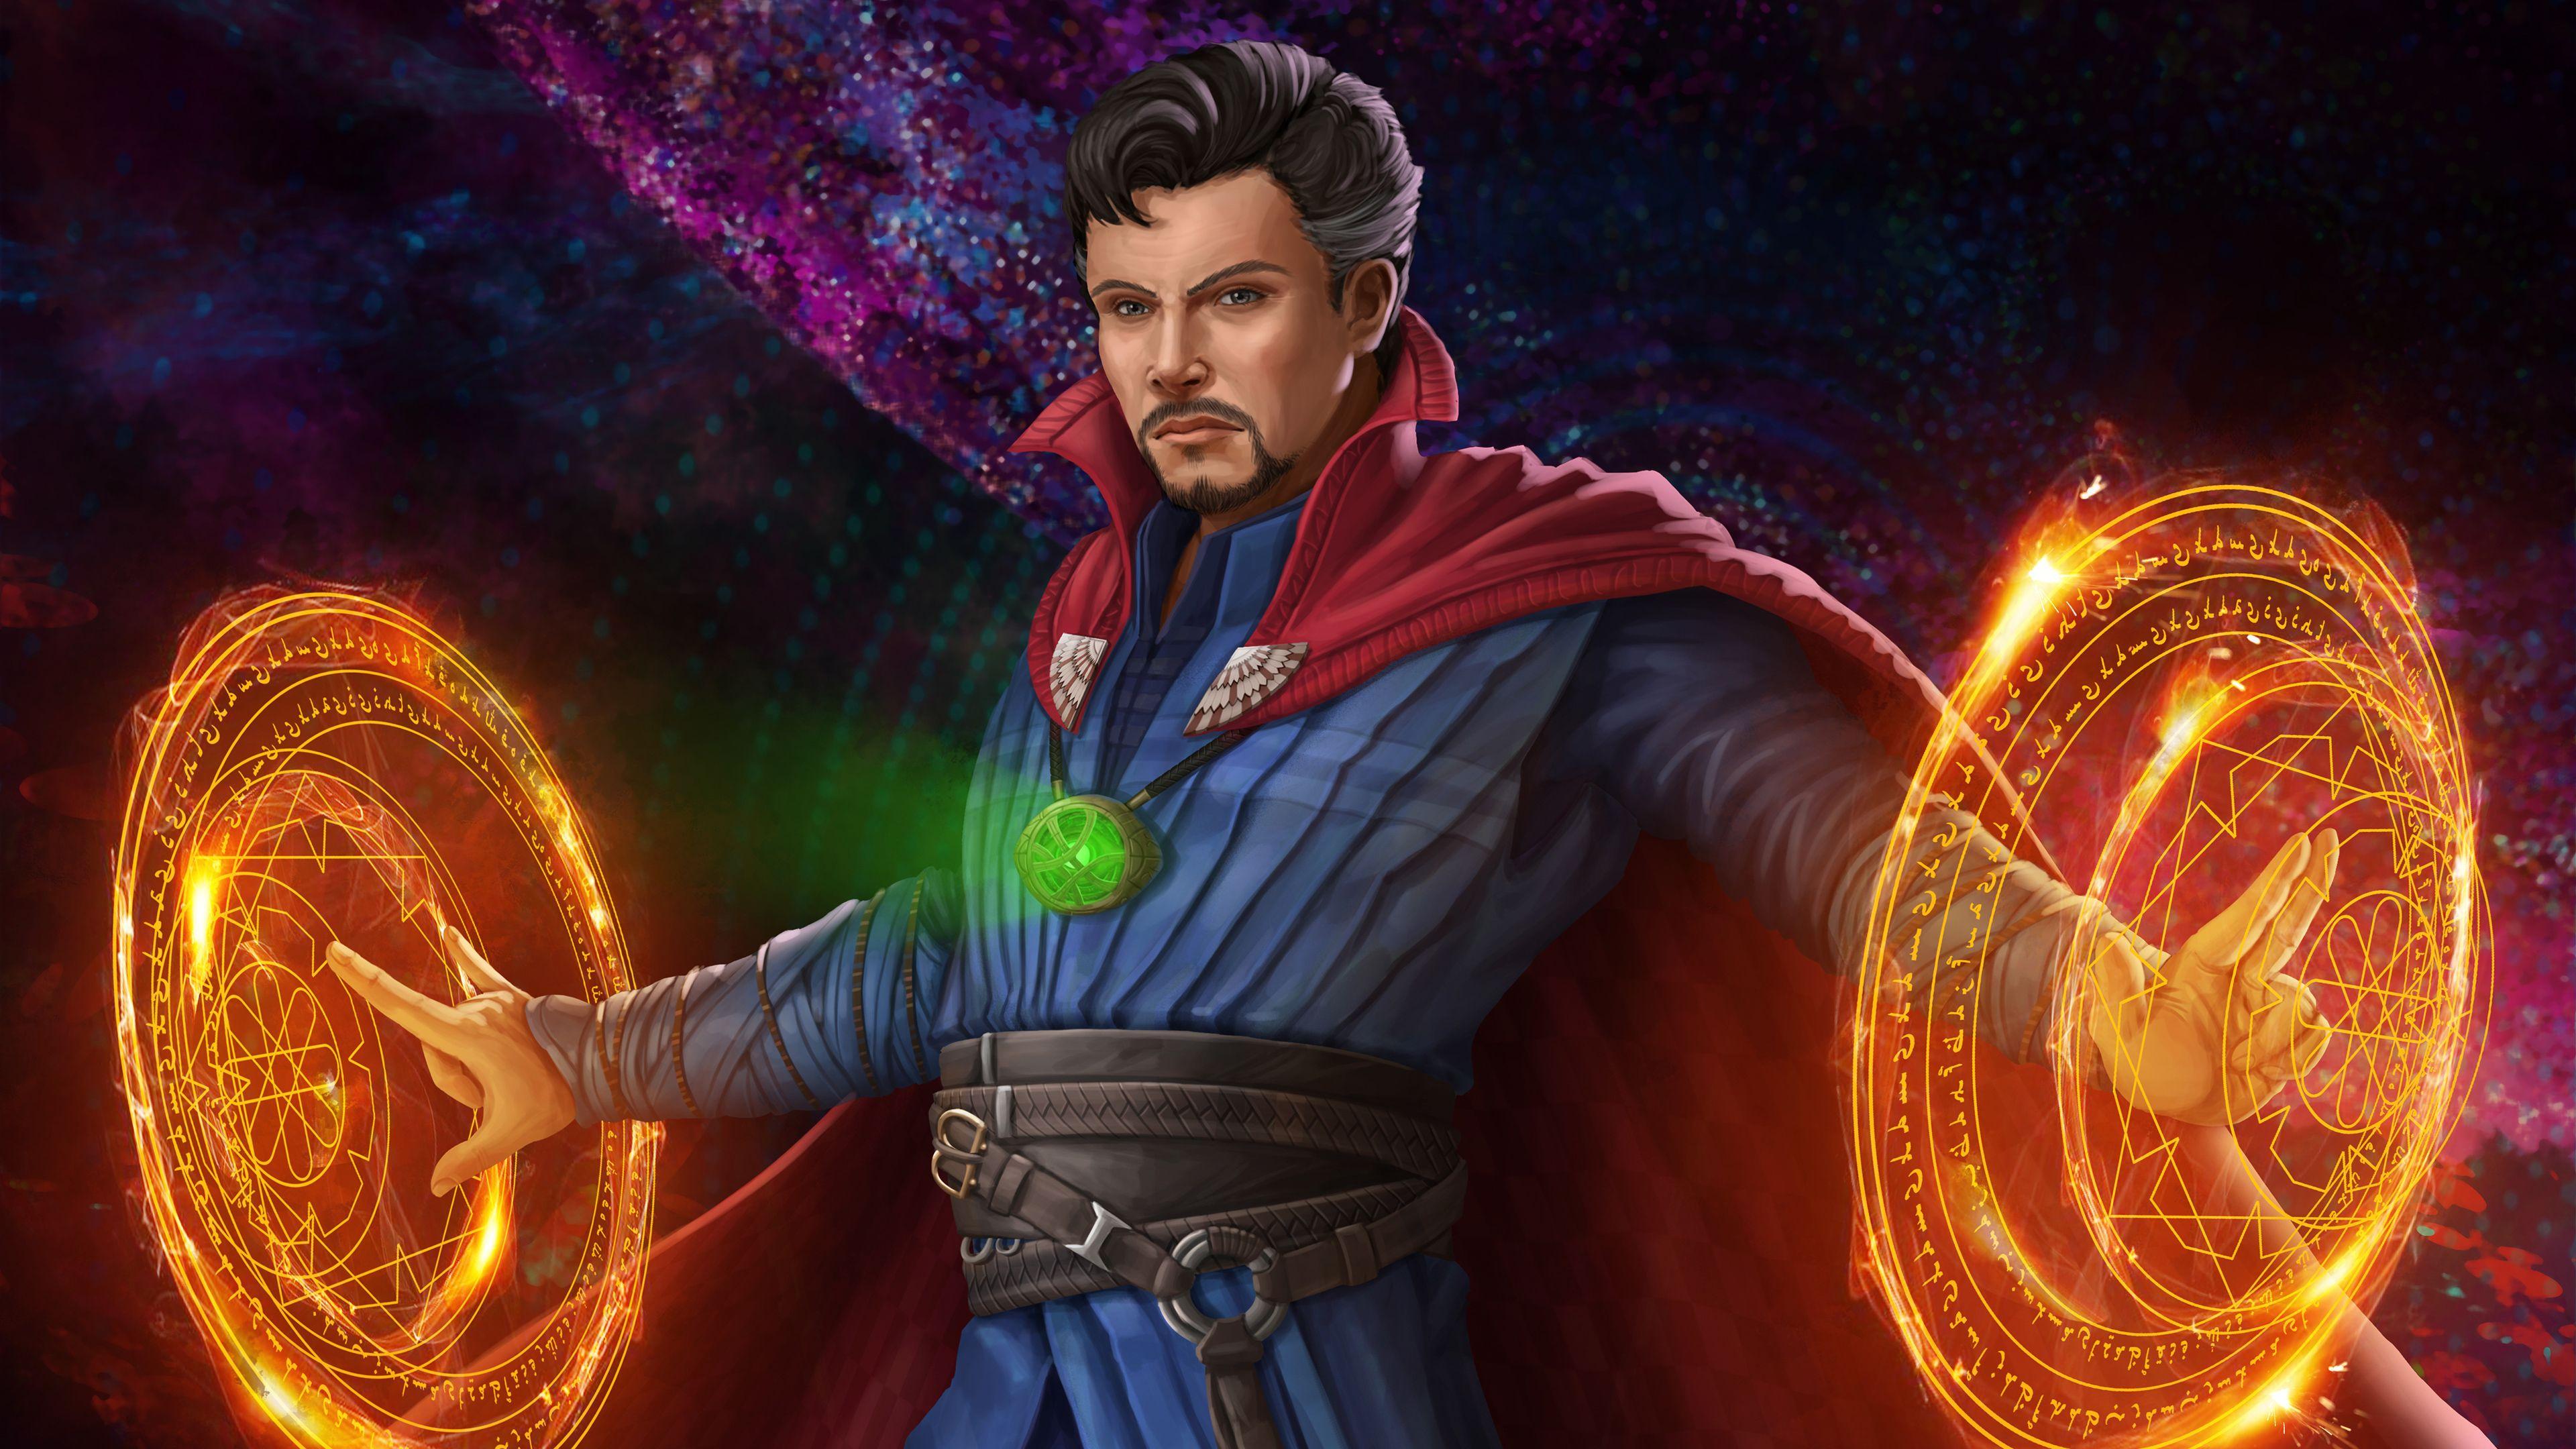 Marvel Doctor Strange 4k Superheroes Wallpapers Hd Wallpapers